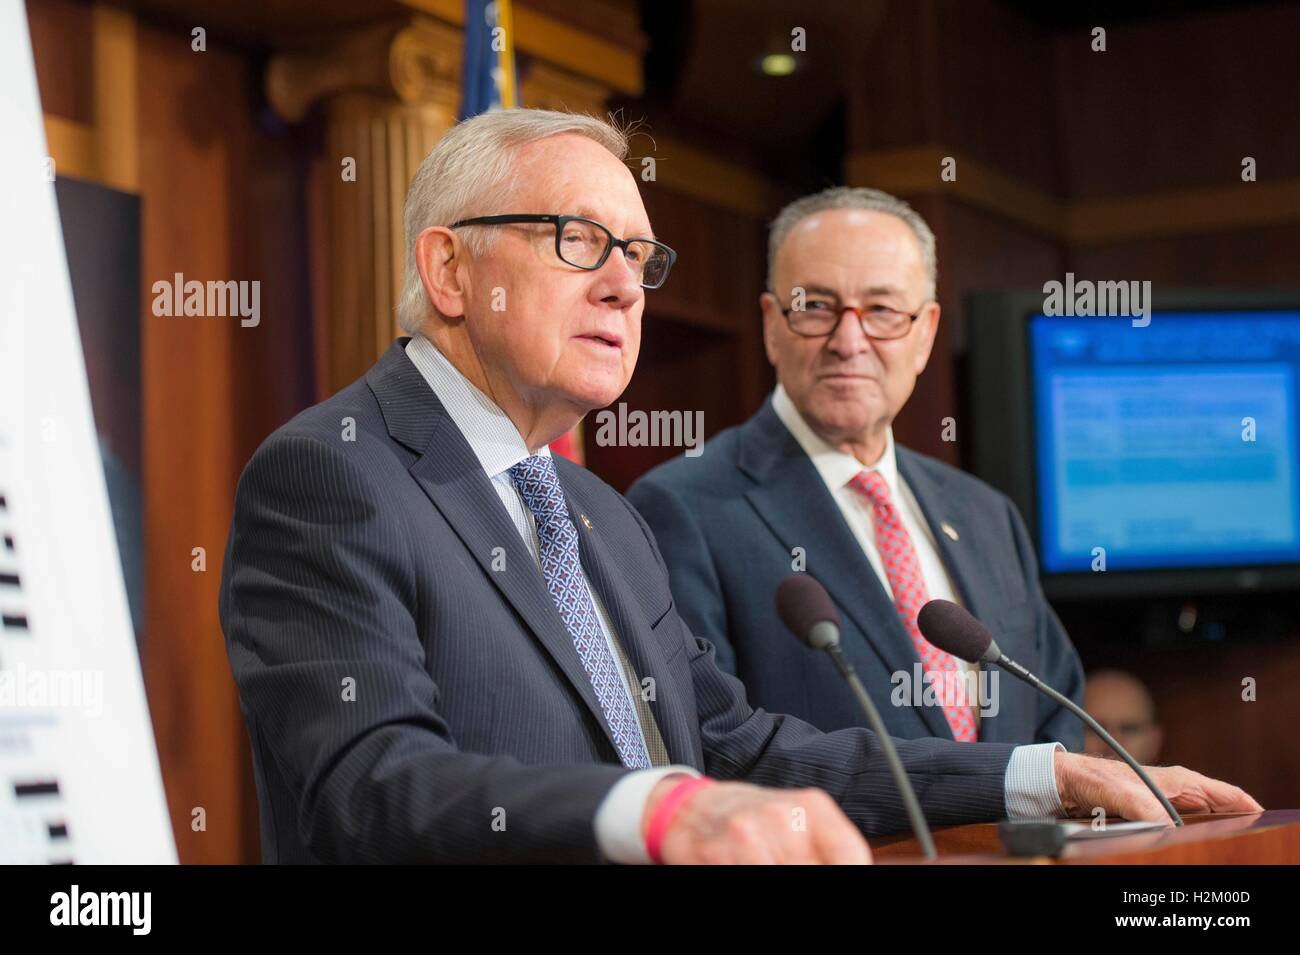 Washington DC, USA. 29th September, 2016. U.S. Democratic Senators Harry Reid and Chuck Schumer highlight the failures - Stock Image